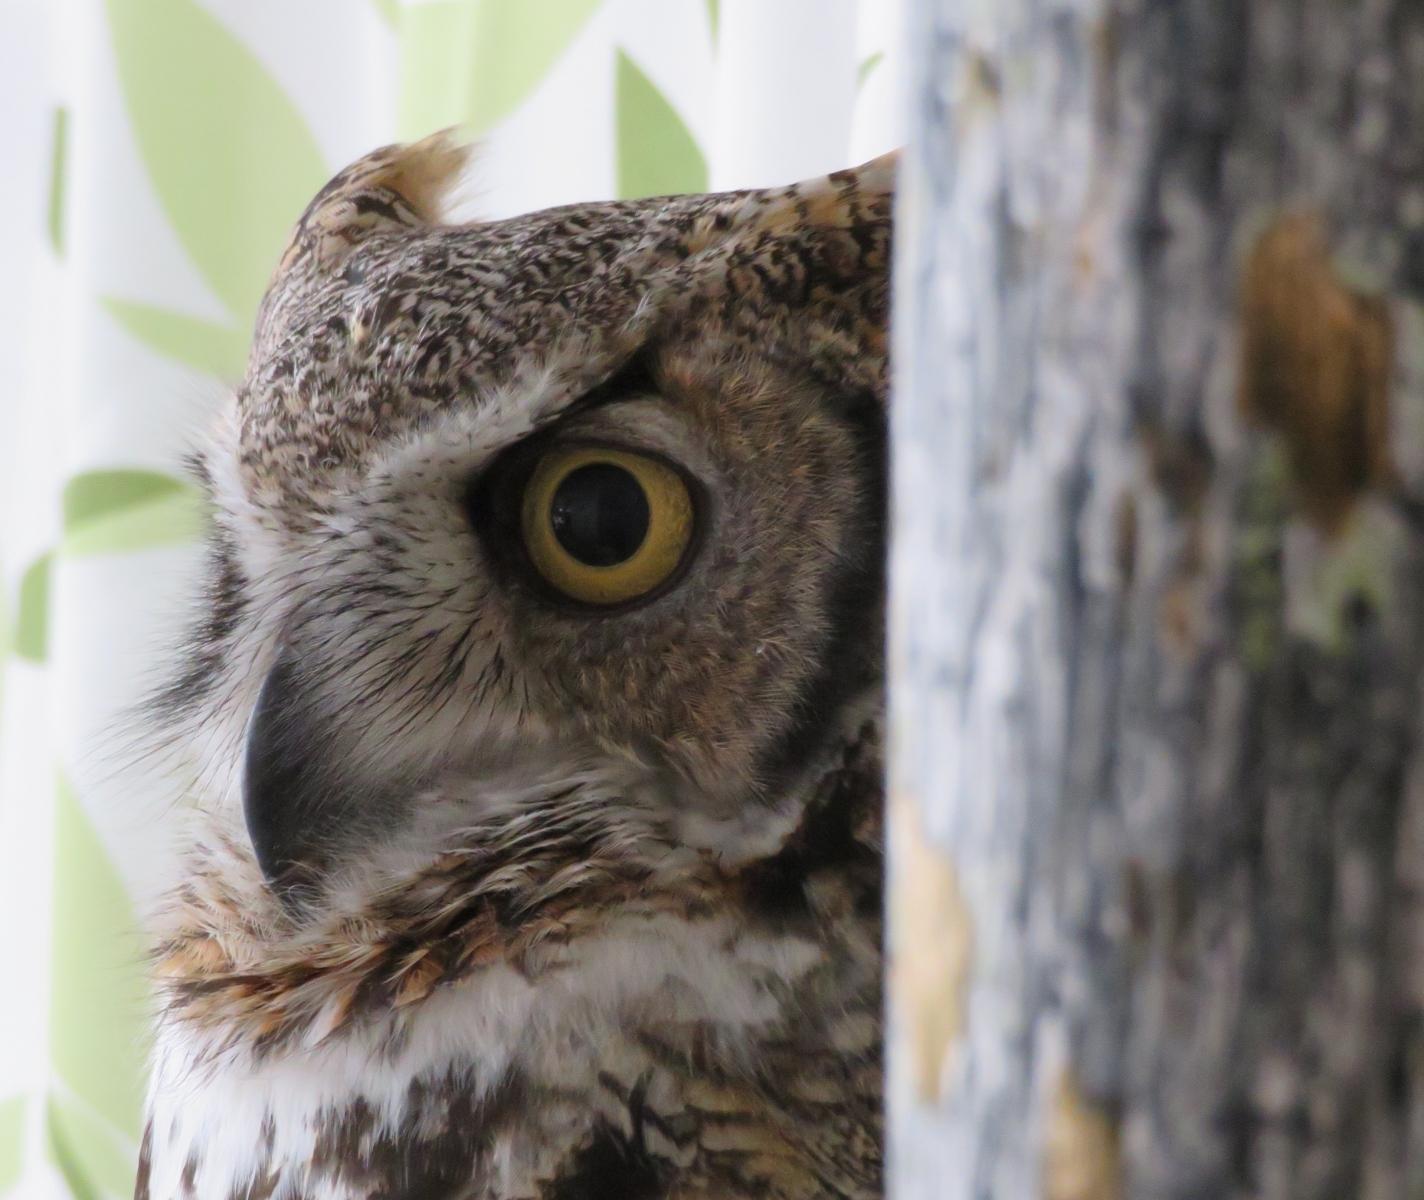 Alice, the great horned owl who started it all at the International Owl Center in Houston, Minnesota. Celebrate her retirement in November 2018. Courtesy Karla Bloem.